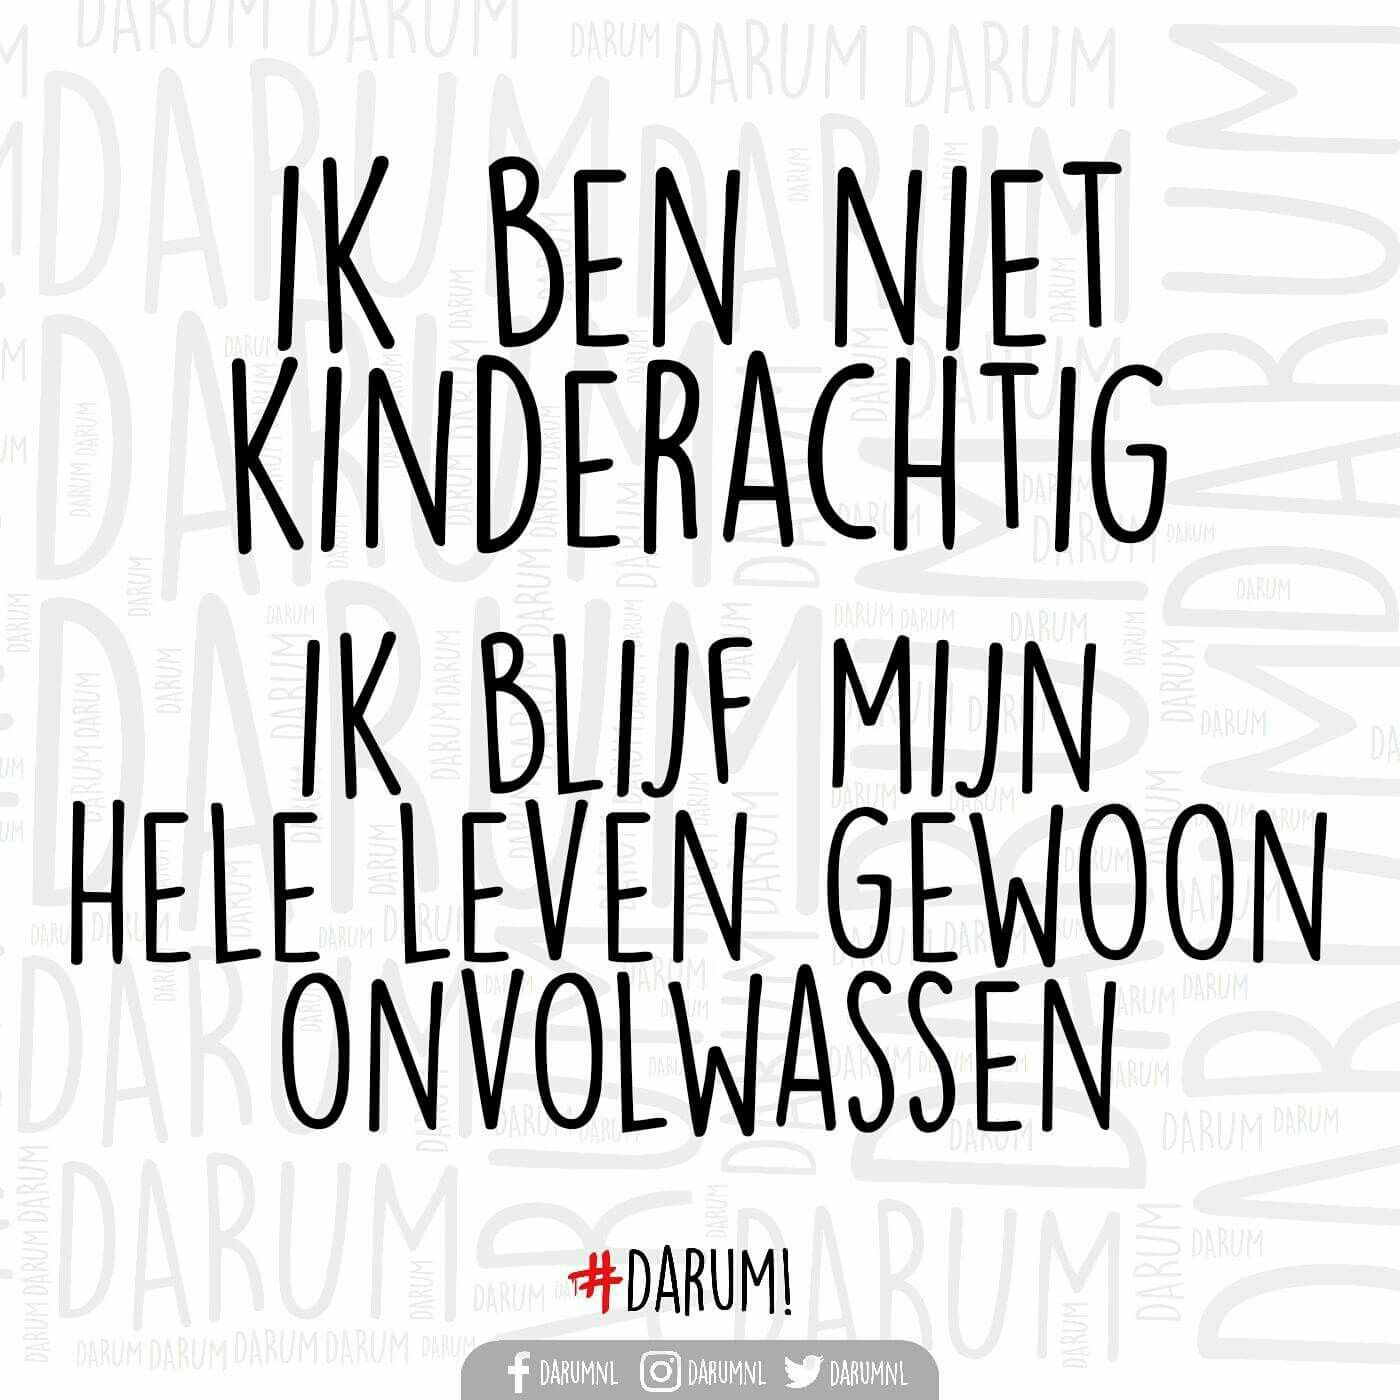 Citaten Grappig Juice : Spreuk citaat nederlands teksten spreuken citaten grappig